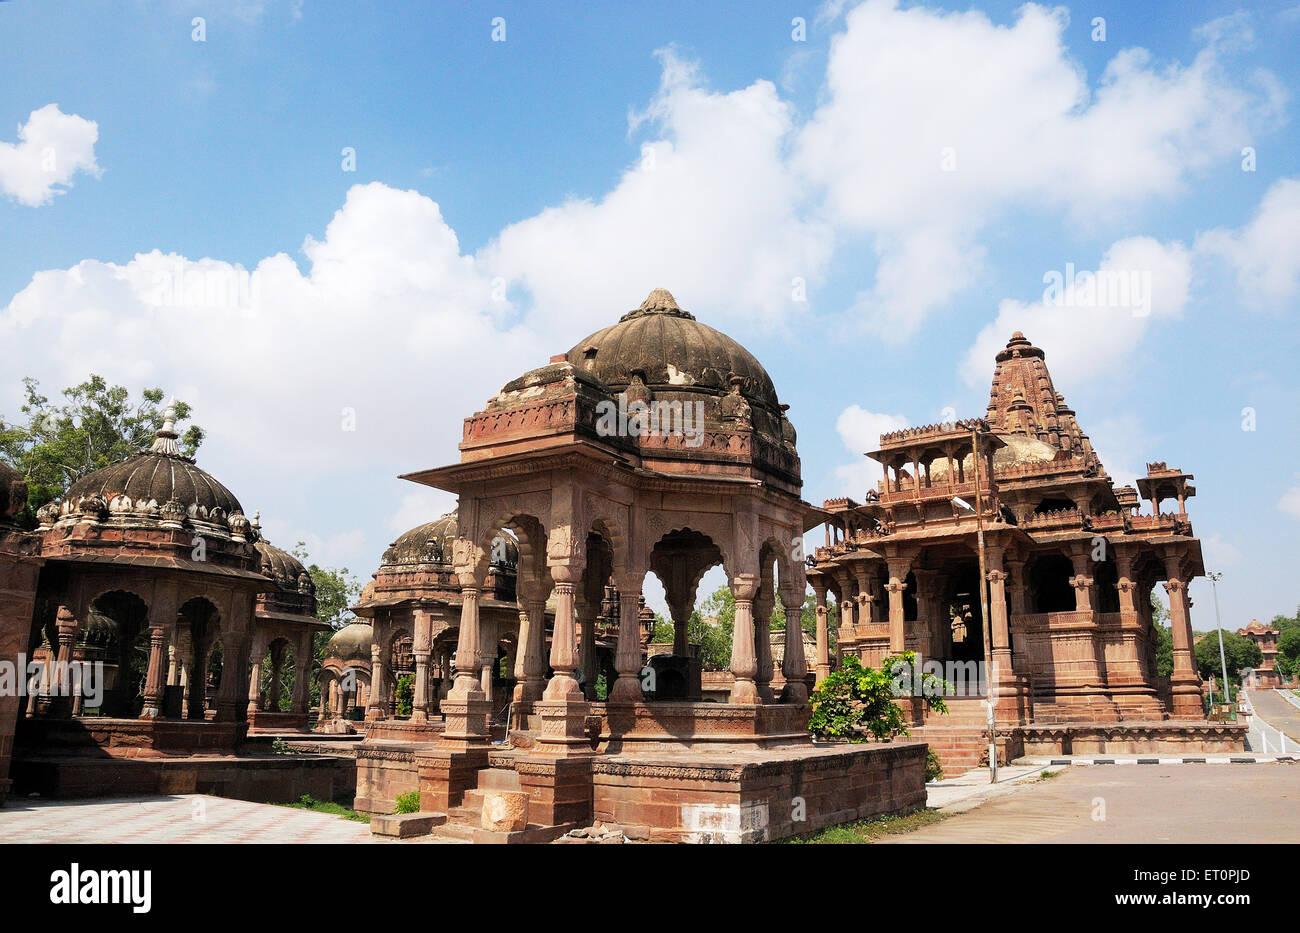 Deval ; Mandore ; Jodhpur ; Rajasthan ; India Stock Photo